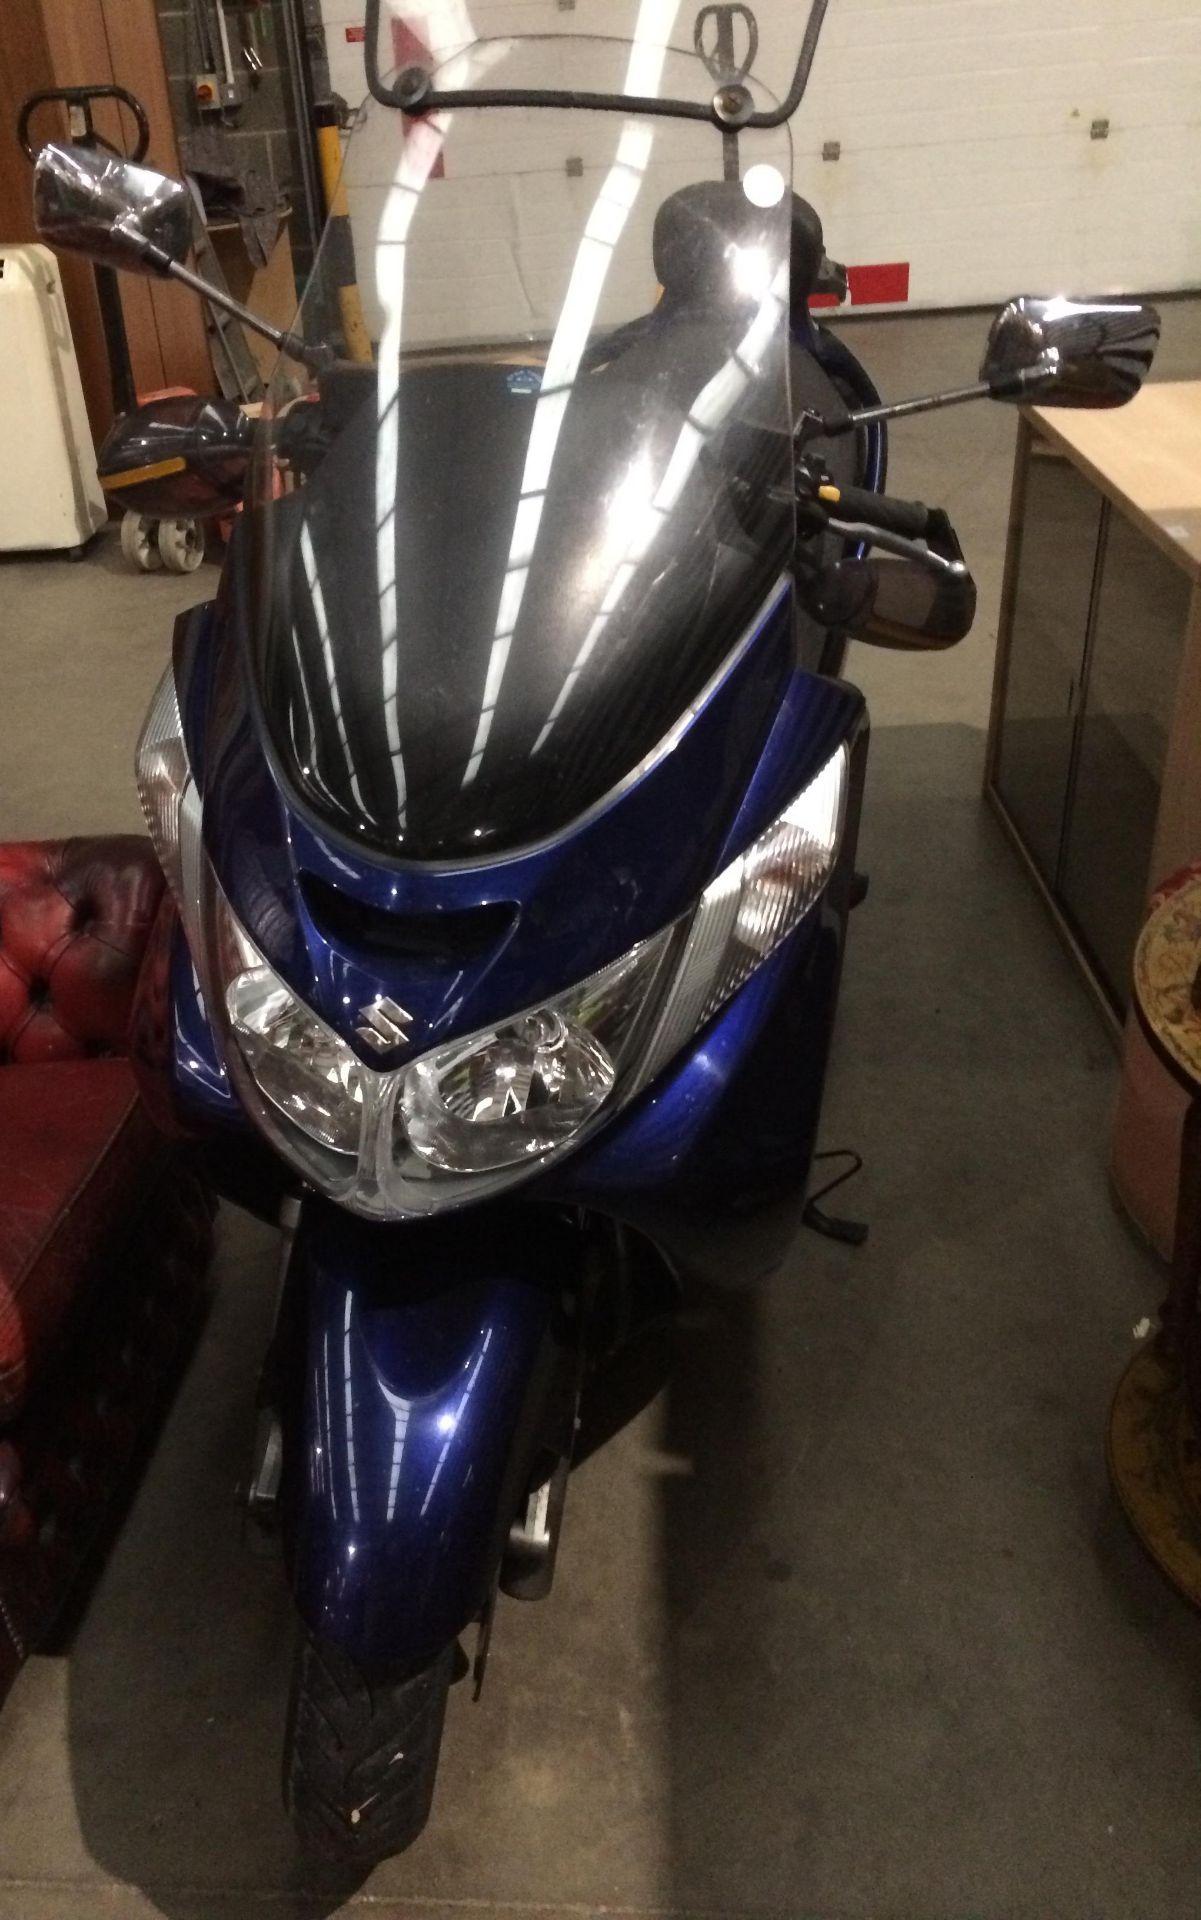 ON BEHALF OF THE INSOLVENCY SERVICE - SUZUKI BERGMAN 400 AN 400KG MOTORCYCLE - petrol - blue Reg - Image 5 of 10